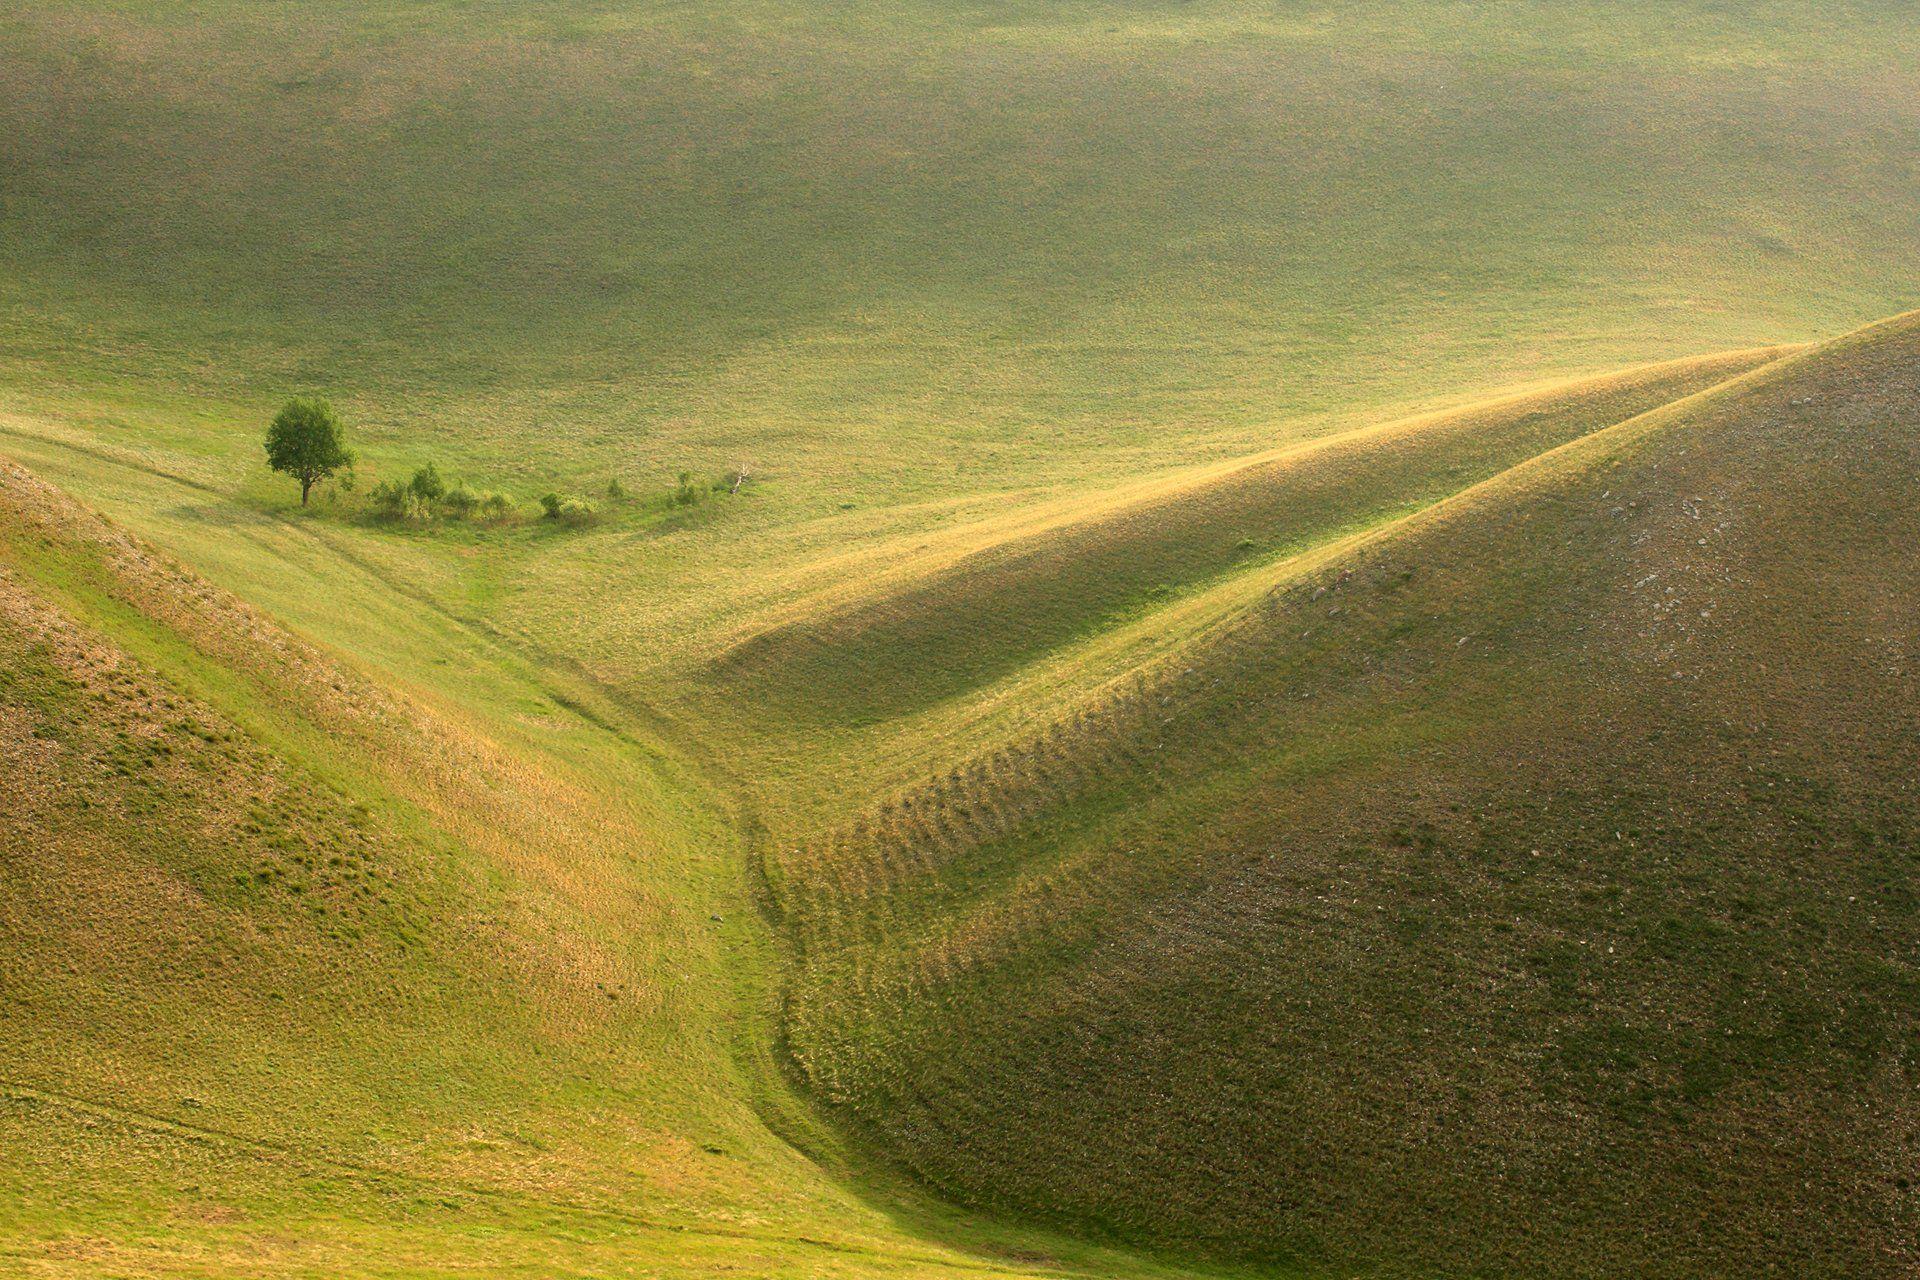 green,may,landscape,canon,canonlens,oleg_grachev,hills,, Грачёв Олег